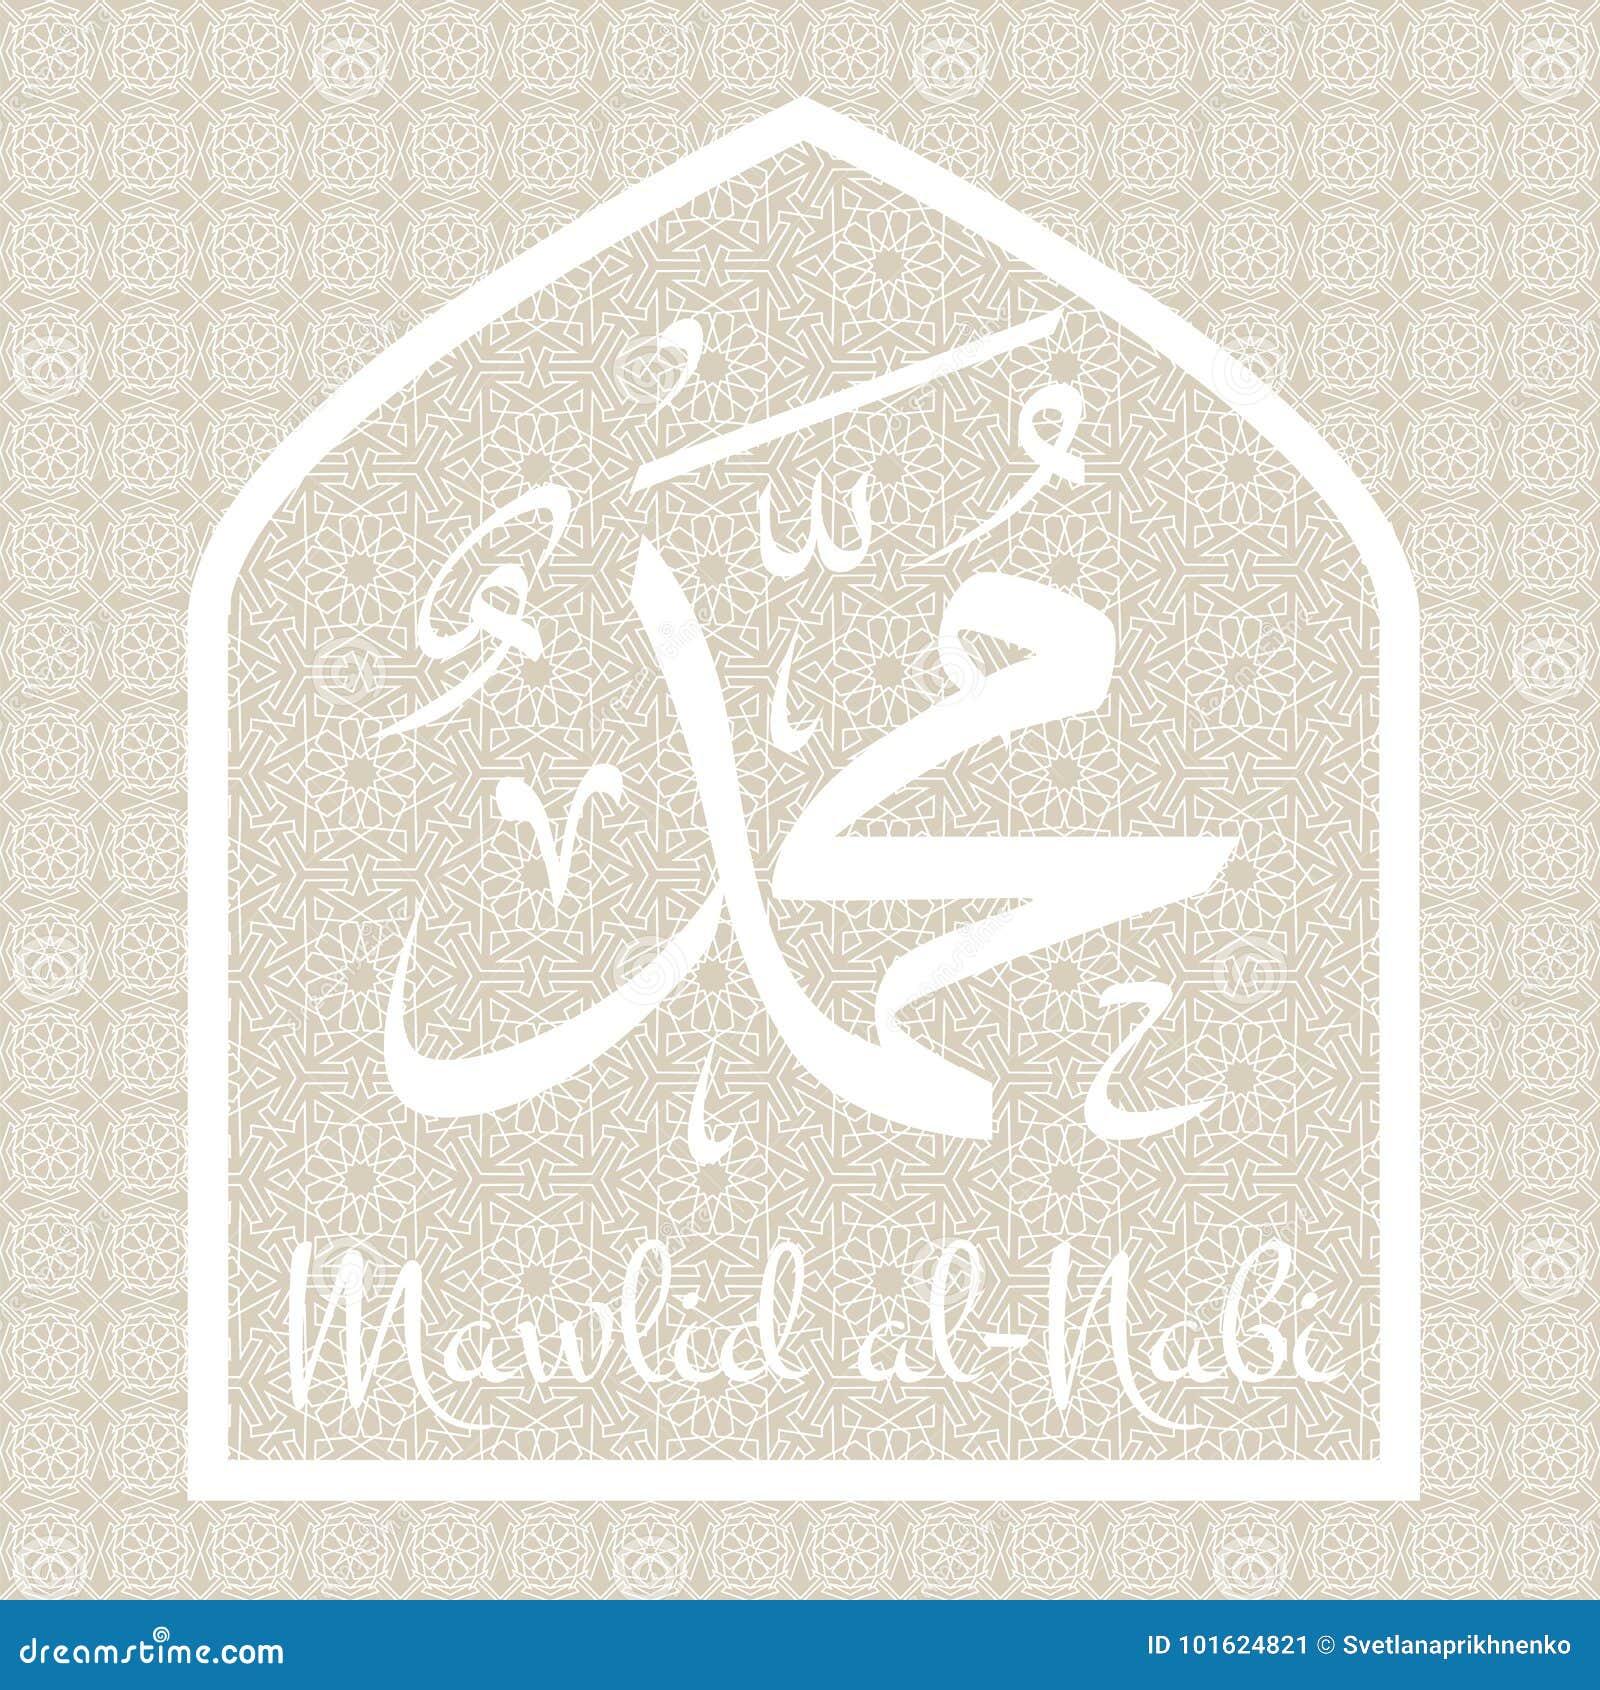 Mawlid al nabi stock vector illustration of kareem 101624821 translation prophet muhammads birthday greeting card for islamic holiday m4hsunfo